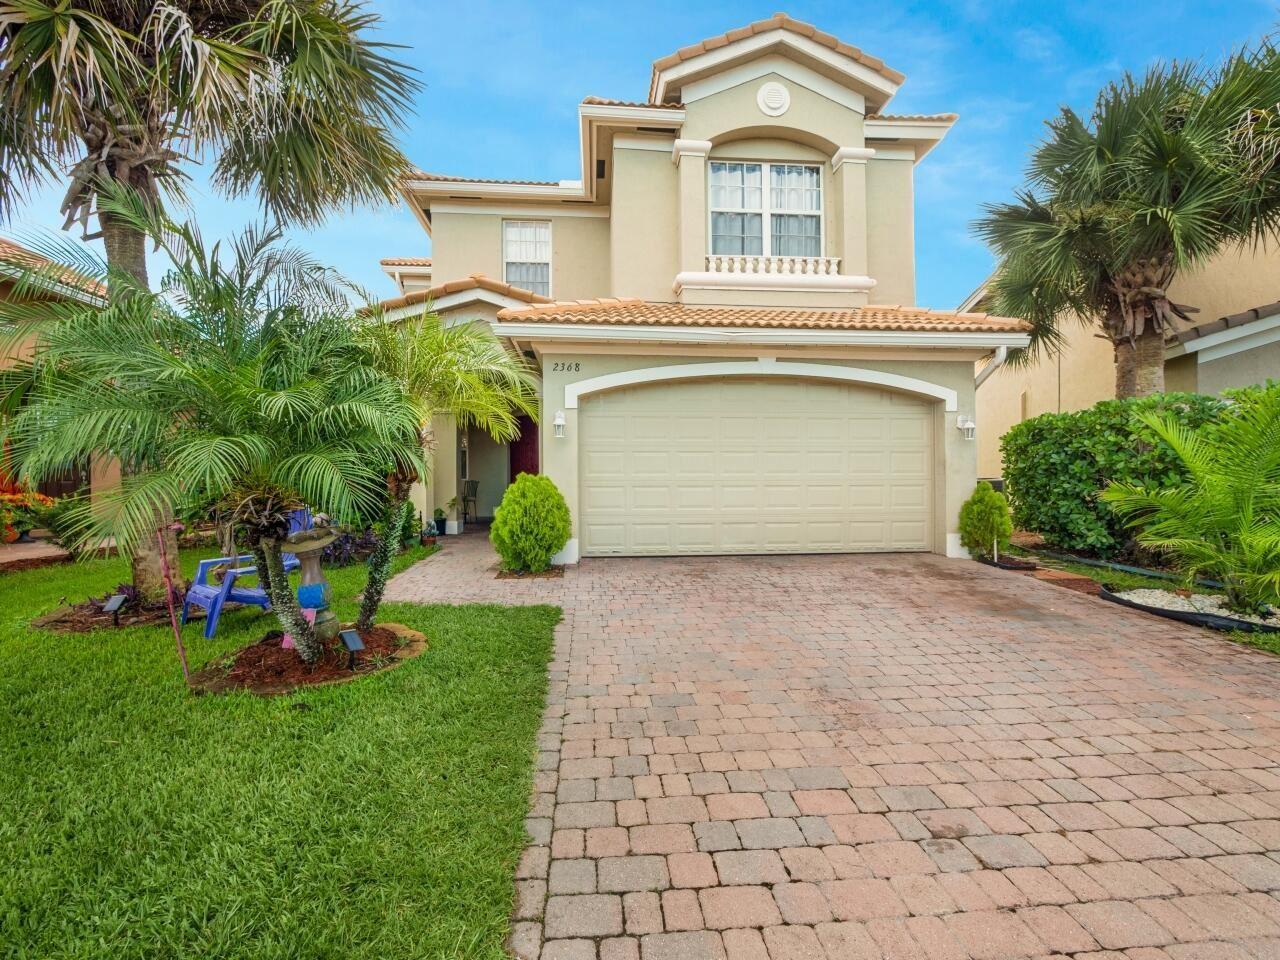 2368 NW Del Corso Court, Port Saint Lucie, FL 34986 - MLS#: RX-10752405